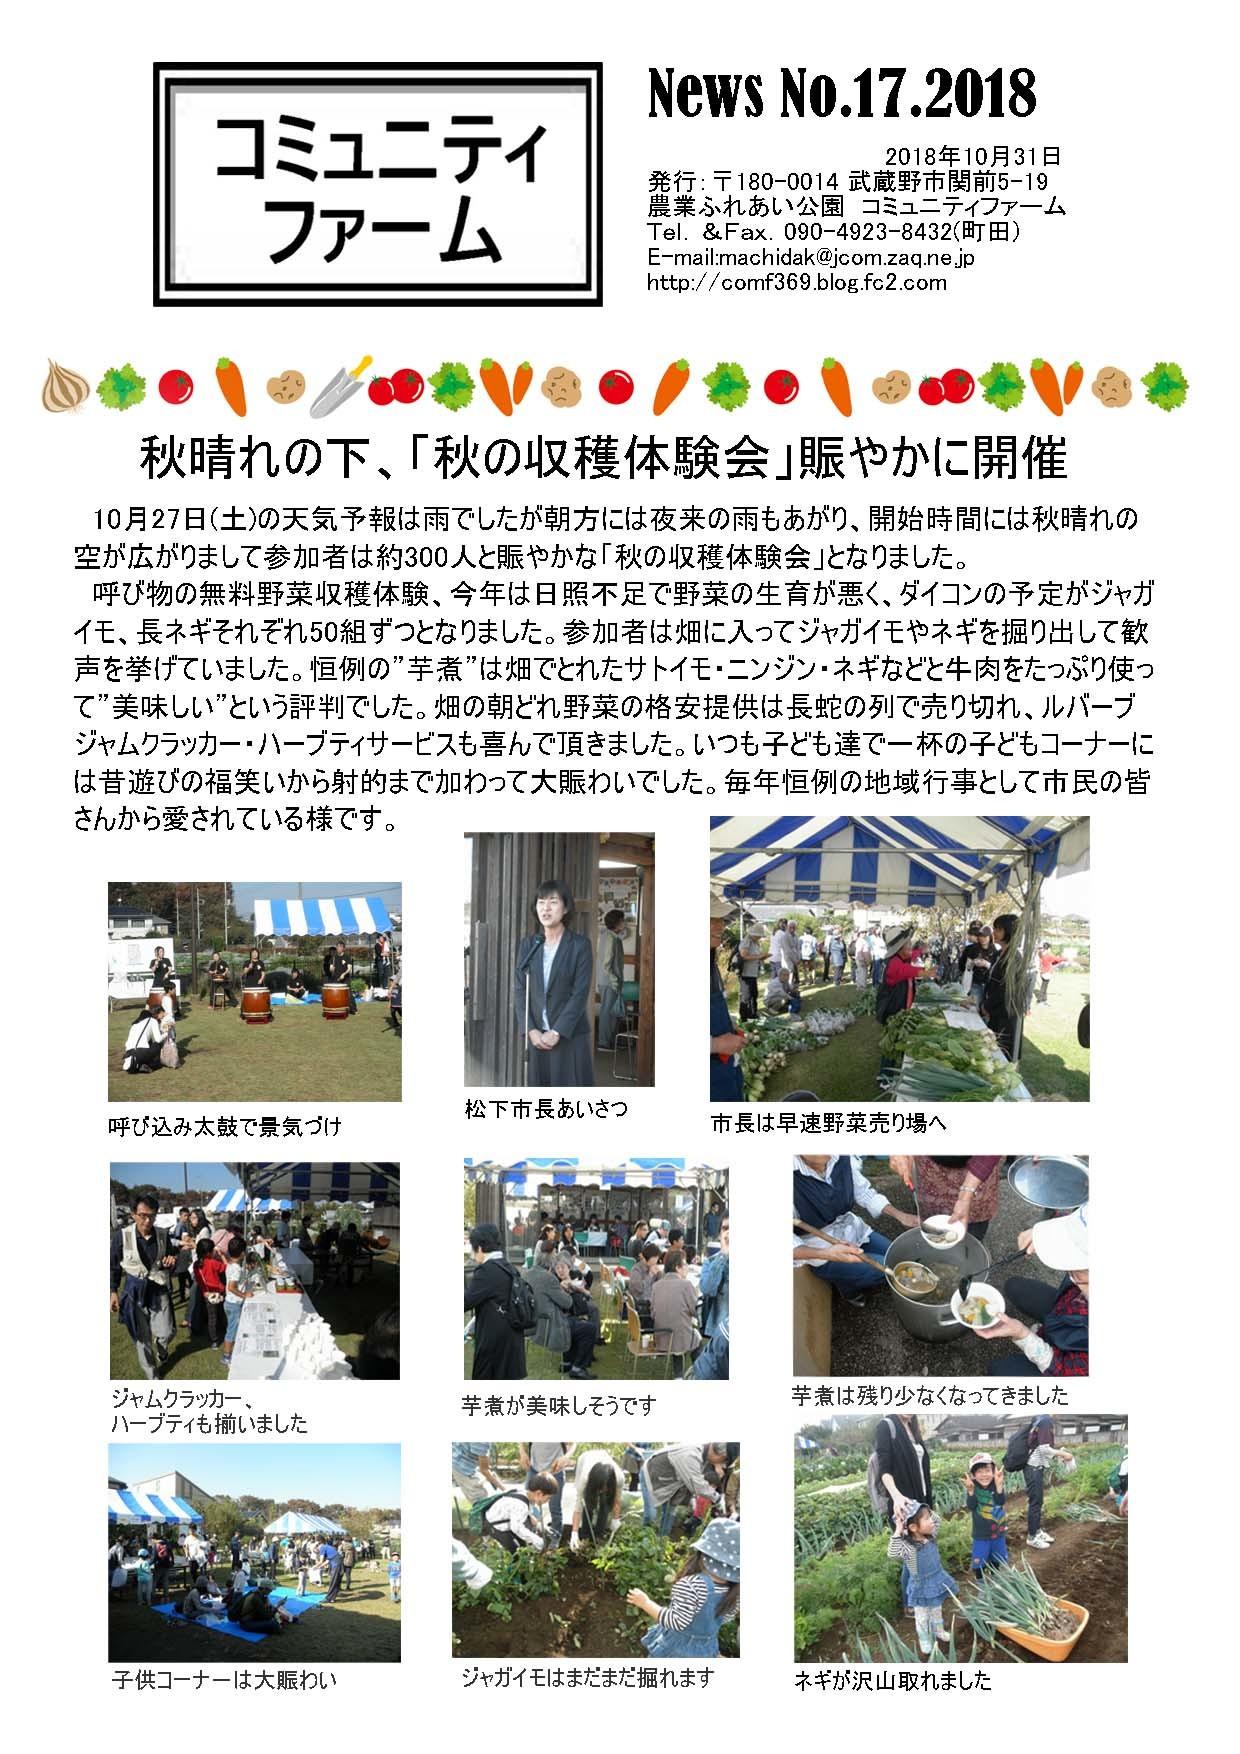 18秋の収穫体験会newsJpg